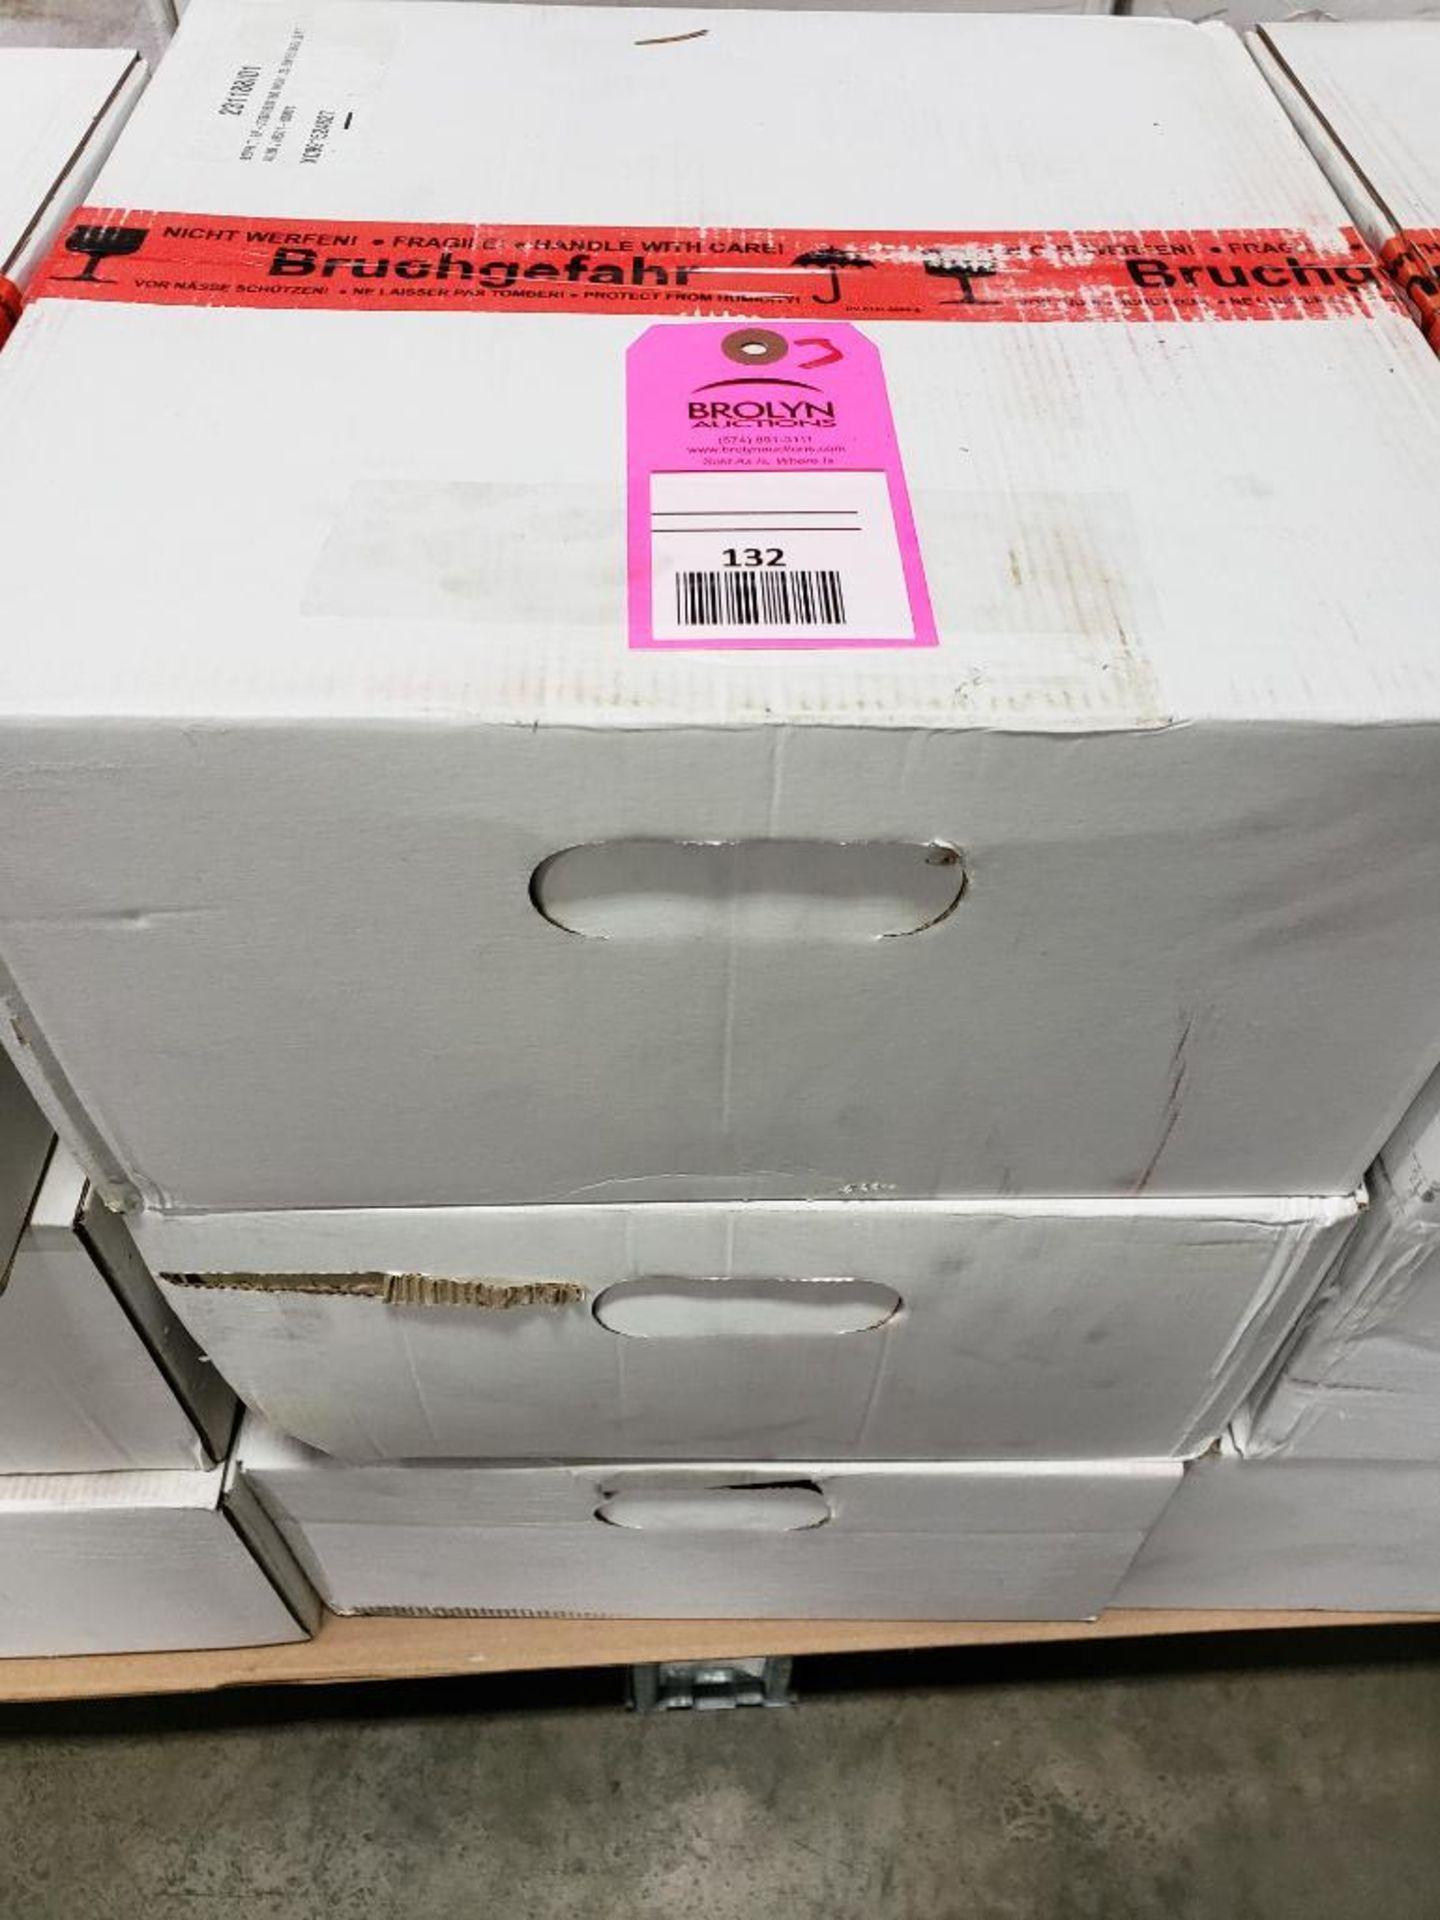 Qty 3 - 3M Abrasives grinding wheels XC991524627. 275x160x160 Mod1,35 EW15-5GG-Left.